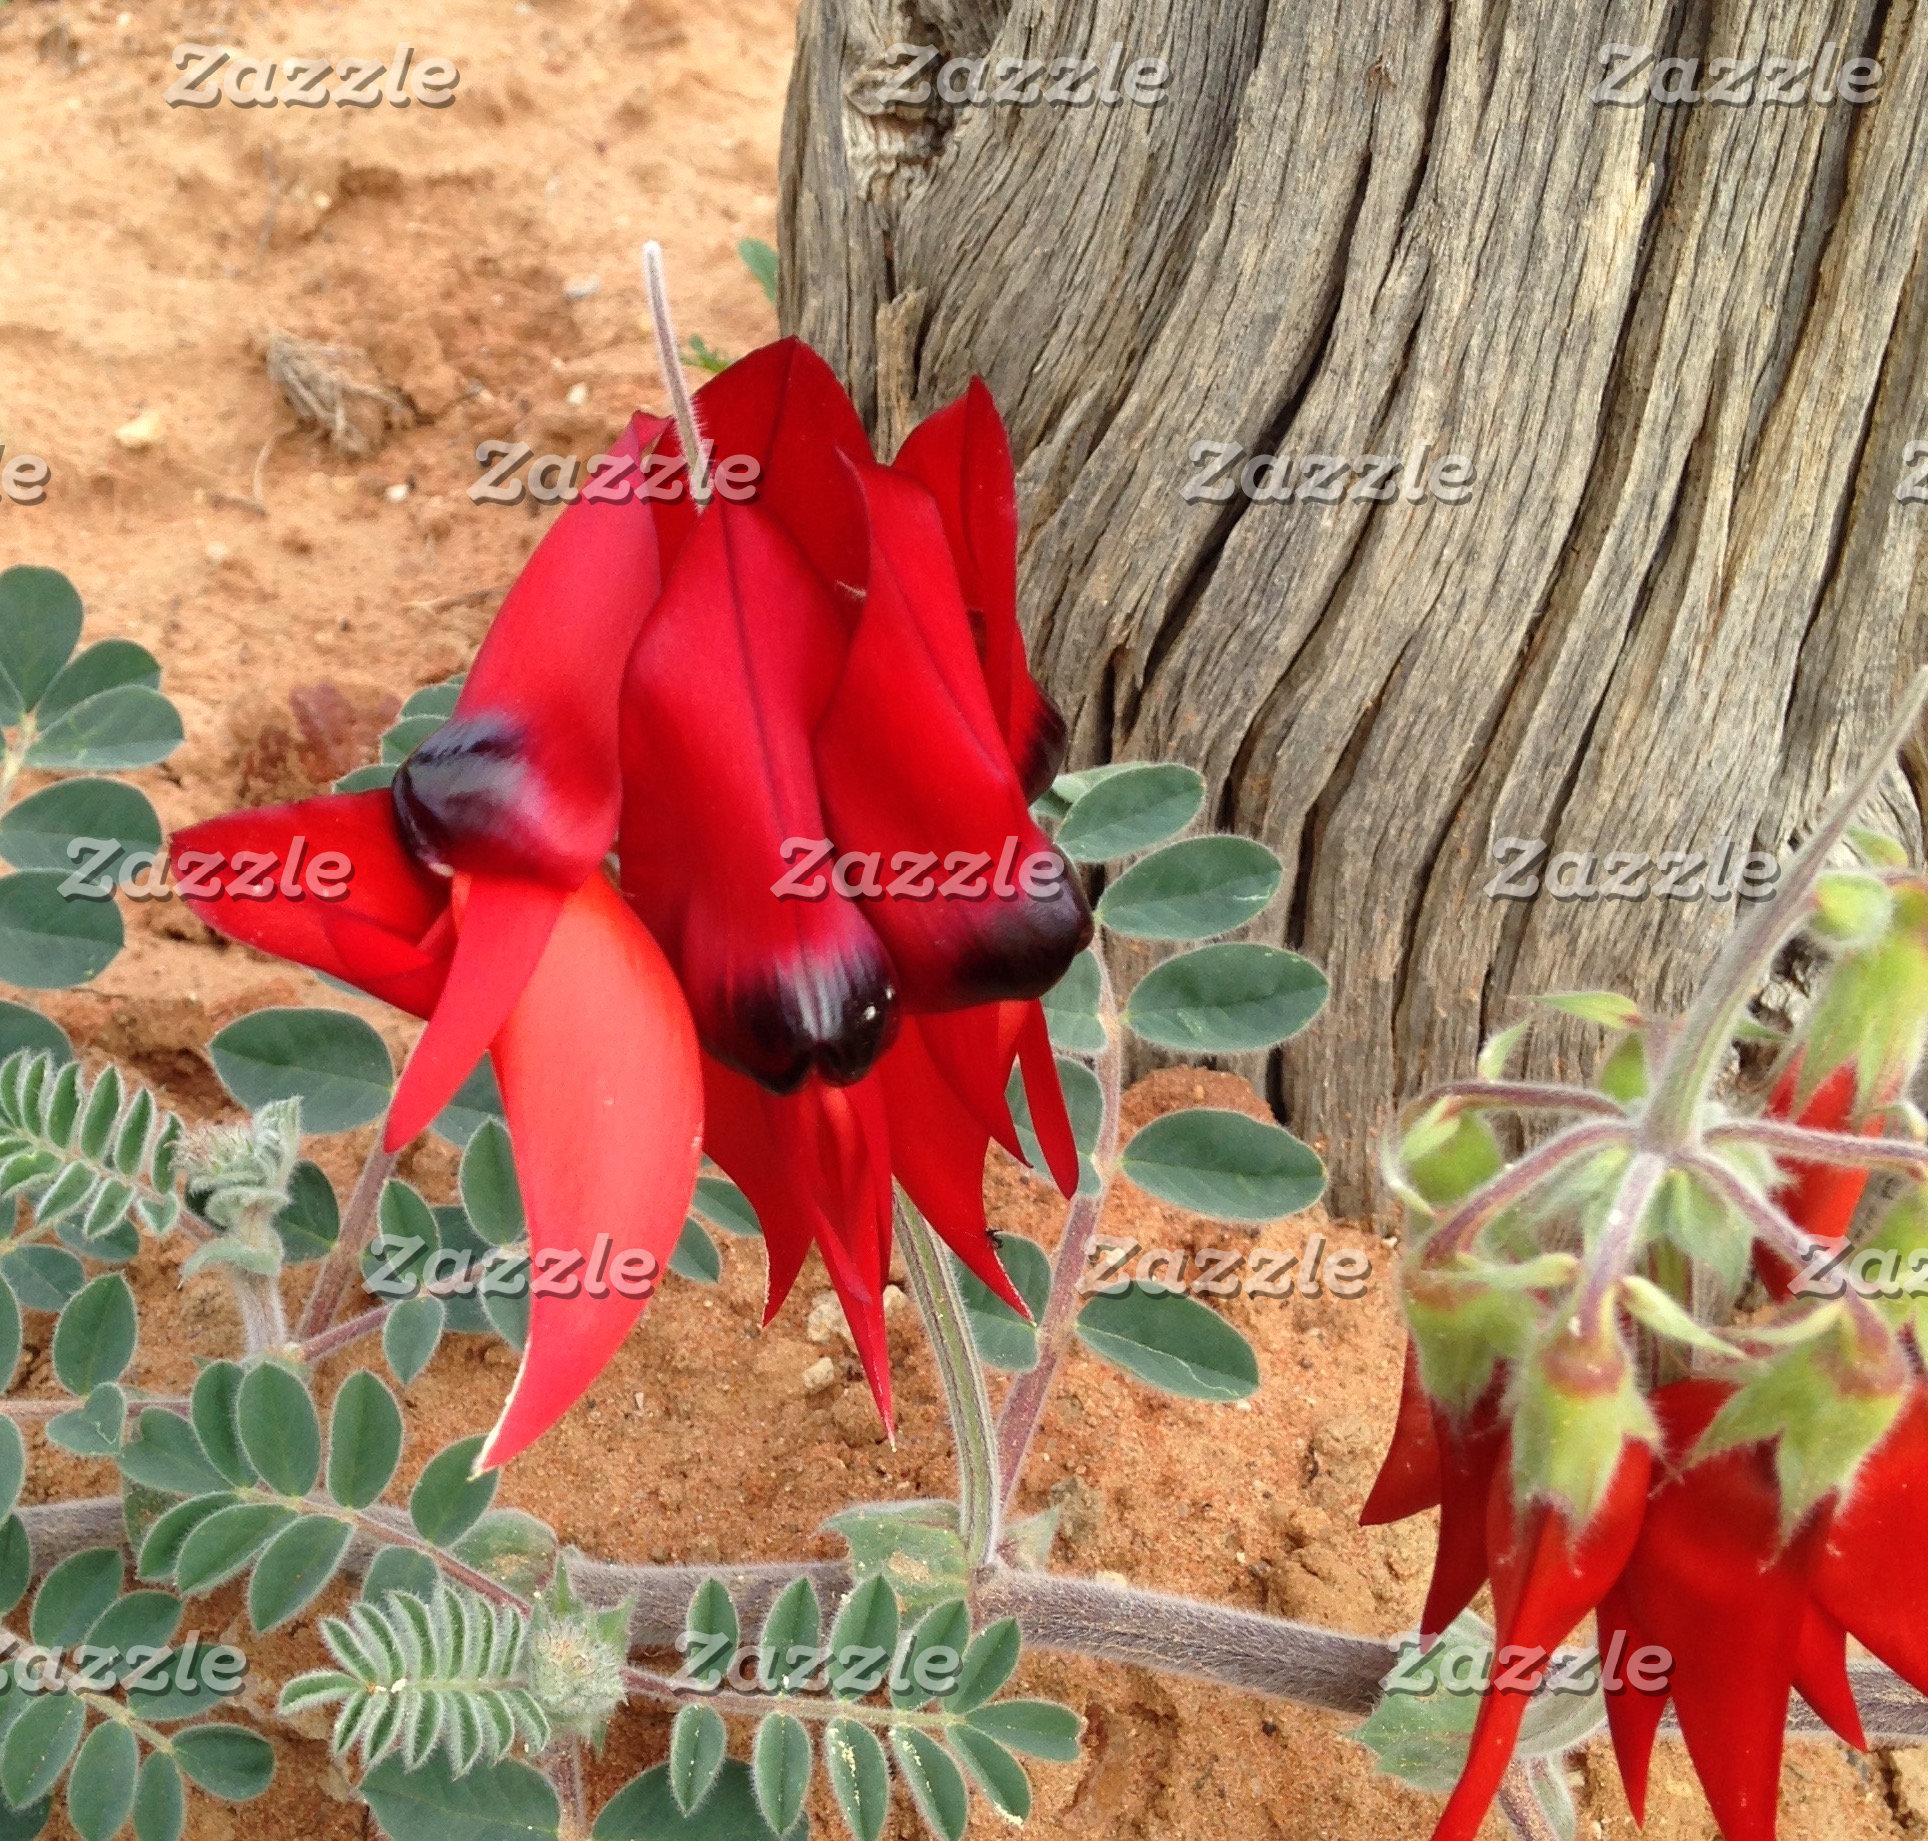 Trees / Plants / Flowers